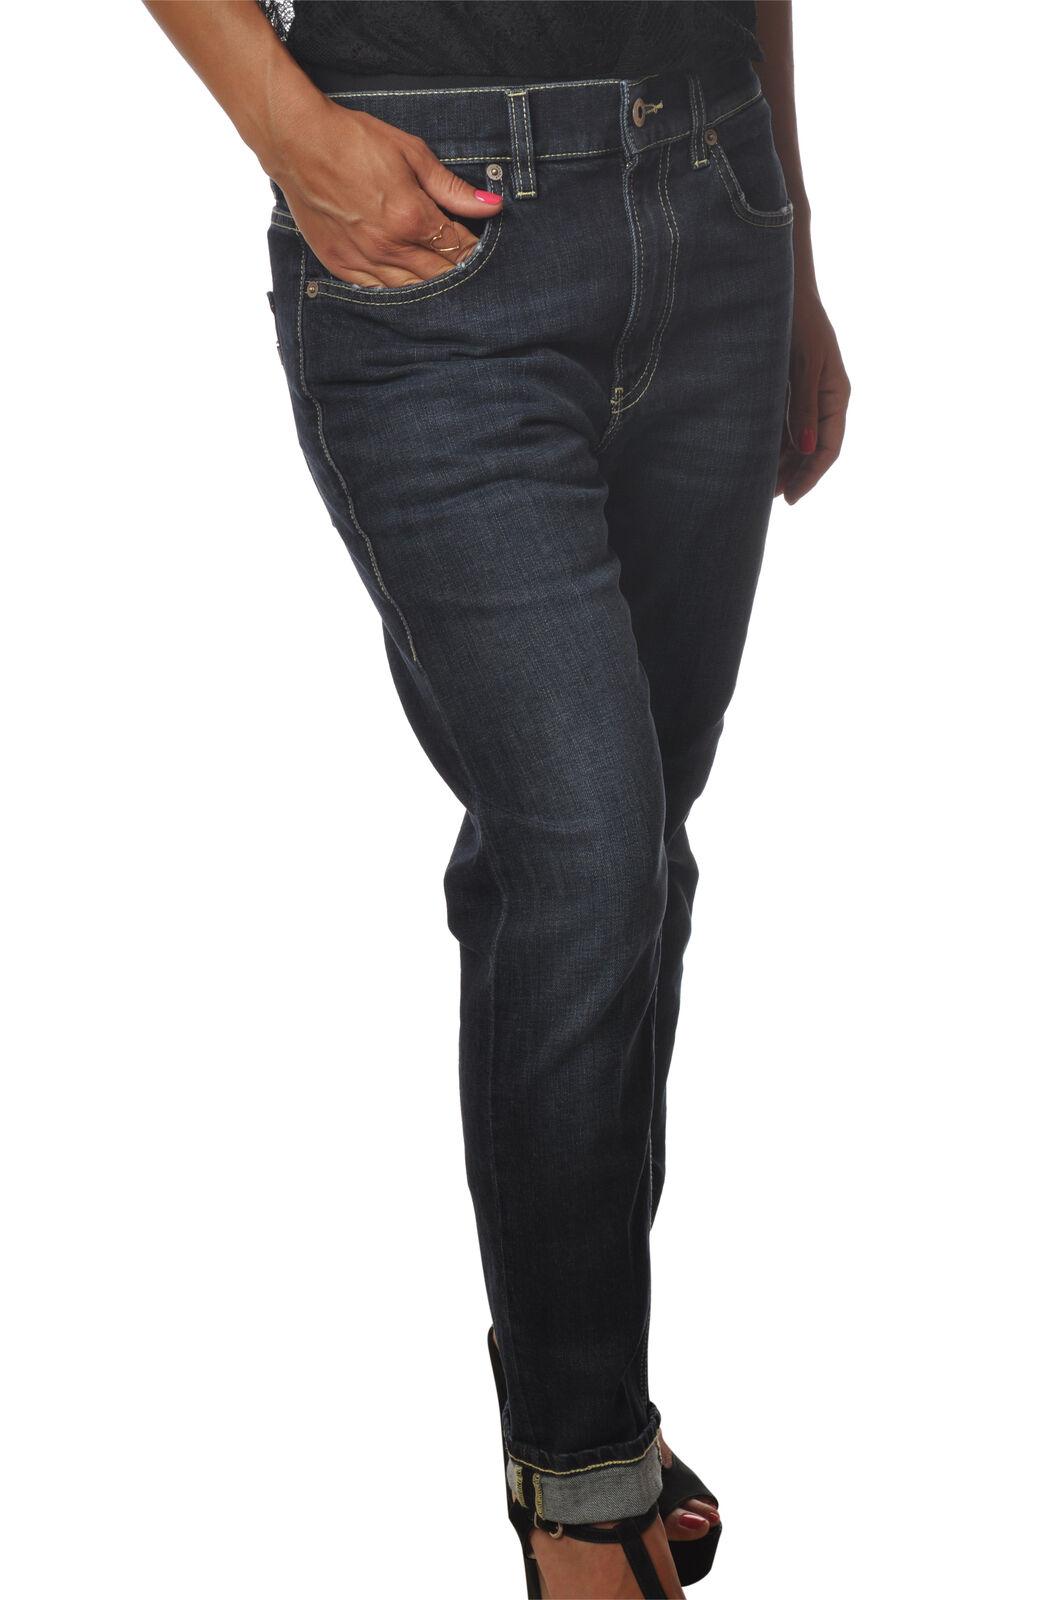 Dondup - Jeans-Hose gerades  bein - Frau - Denim - 6398216G191432  ventas en linea